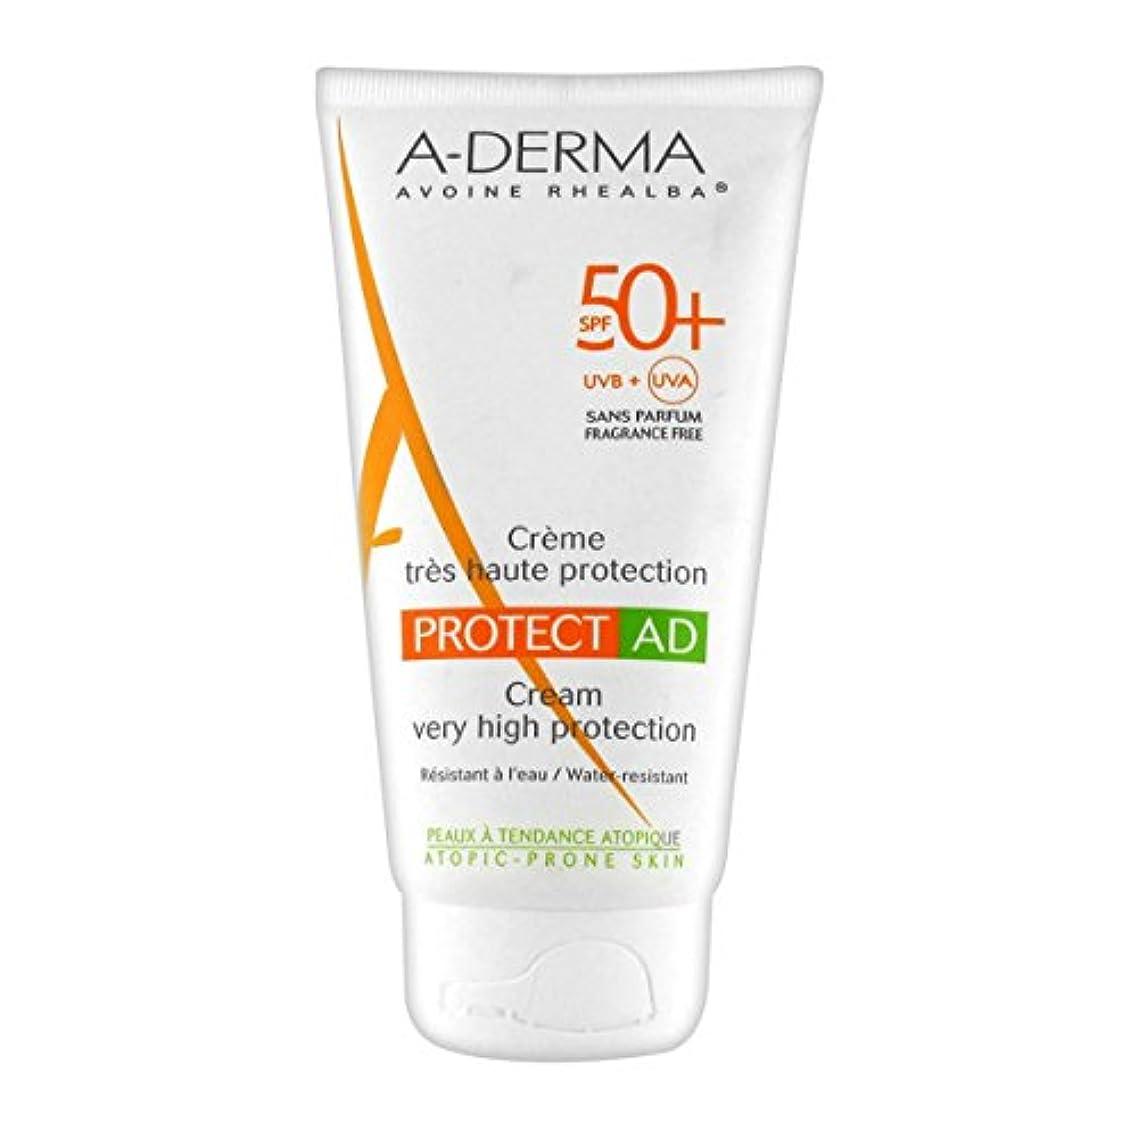 A-derma Protect Ad Cream Spf50+ 150ml [並行輸入品]